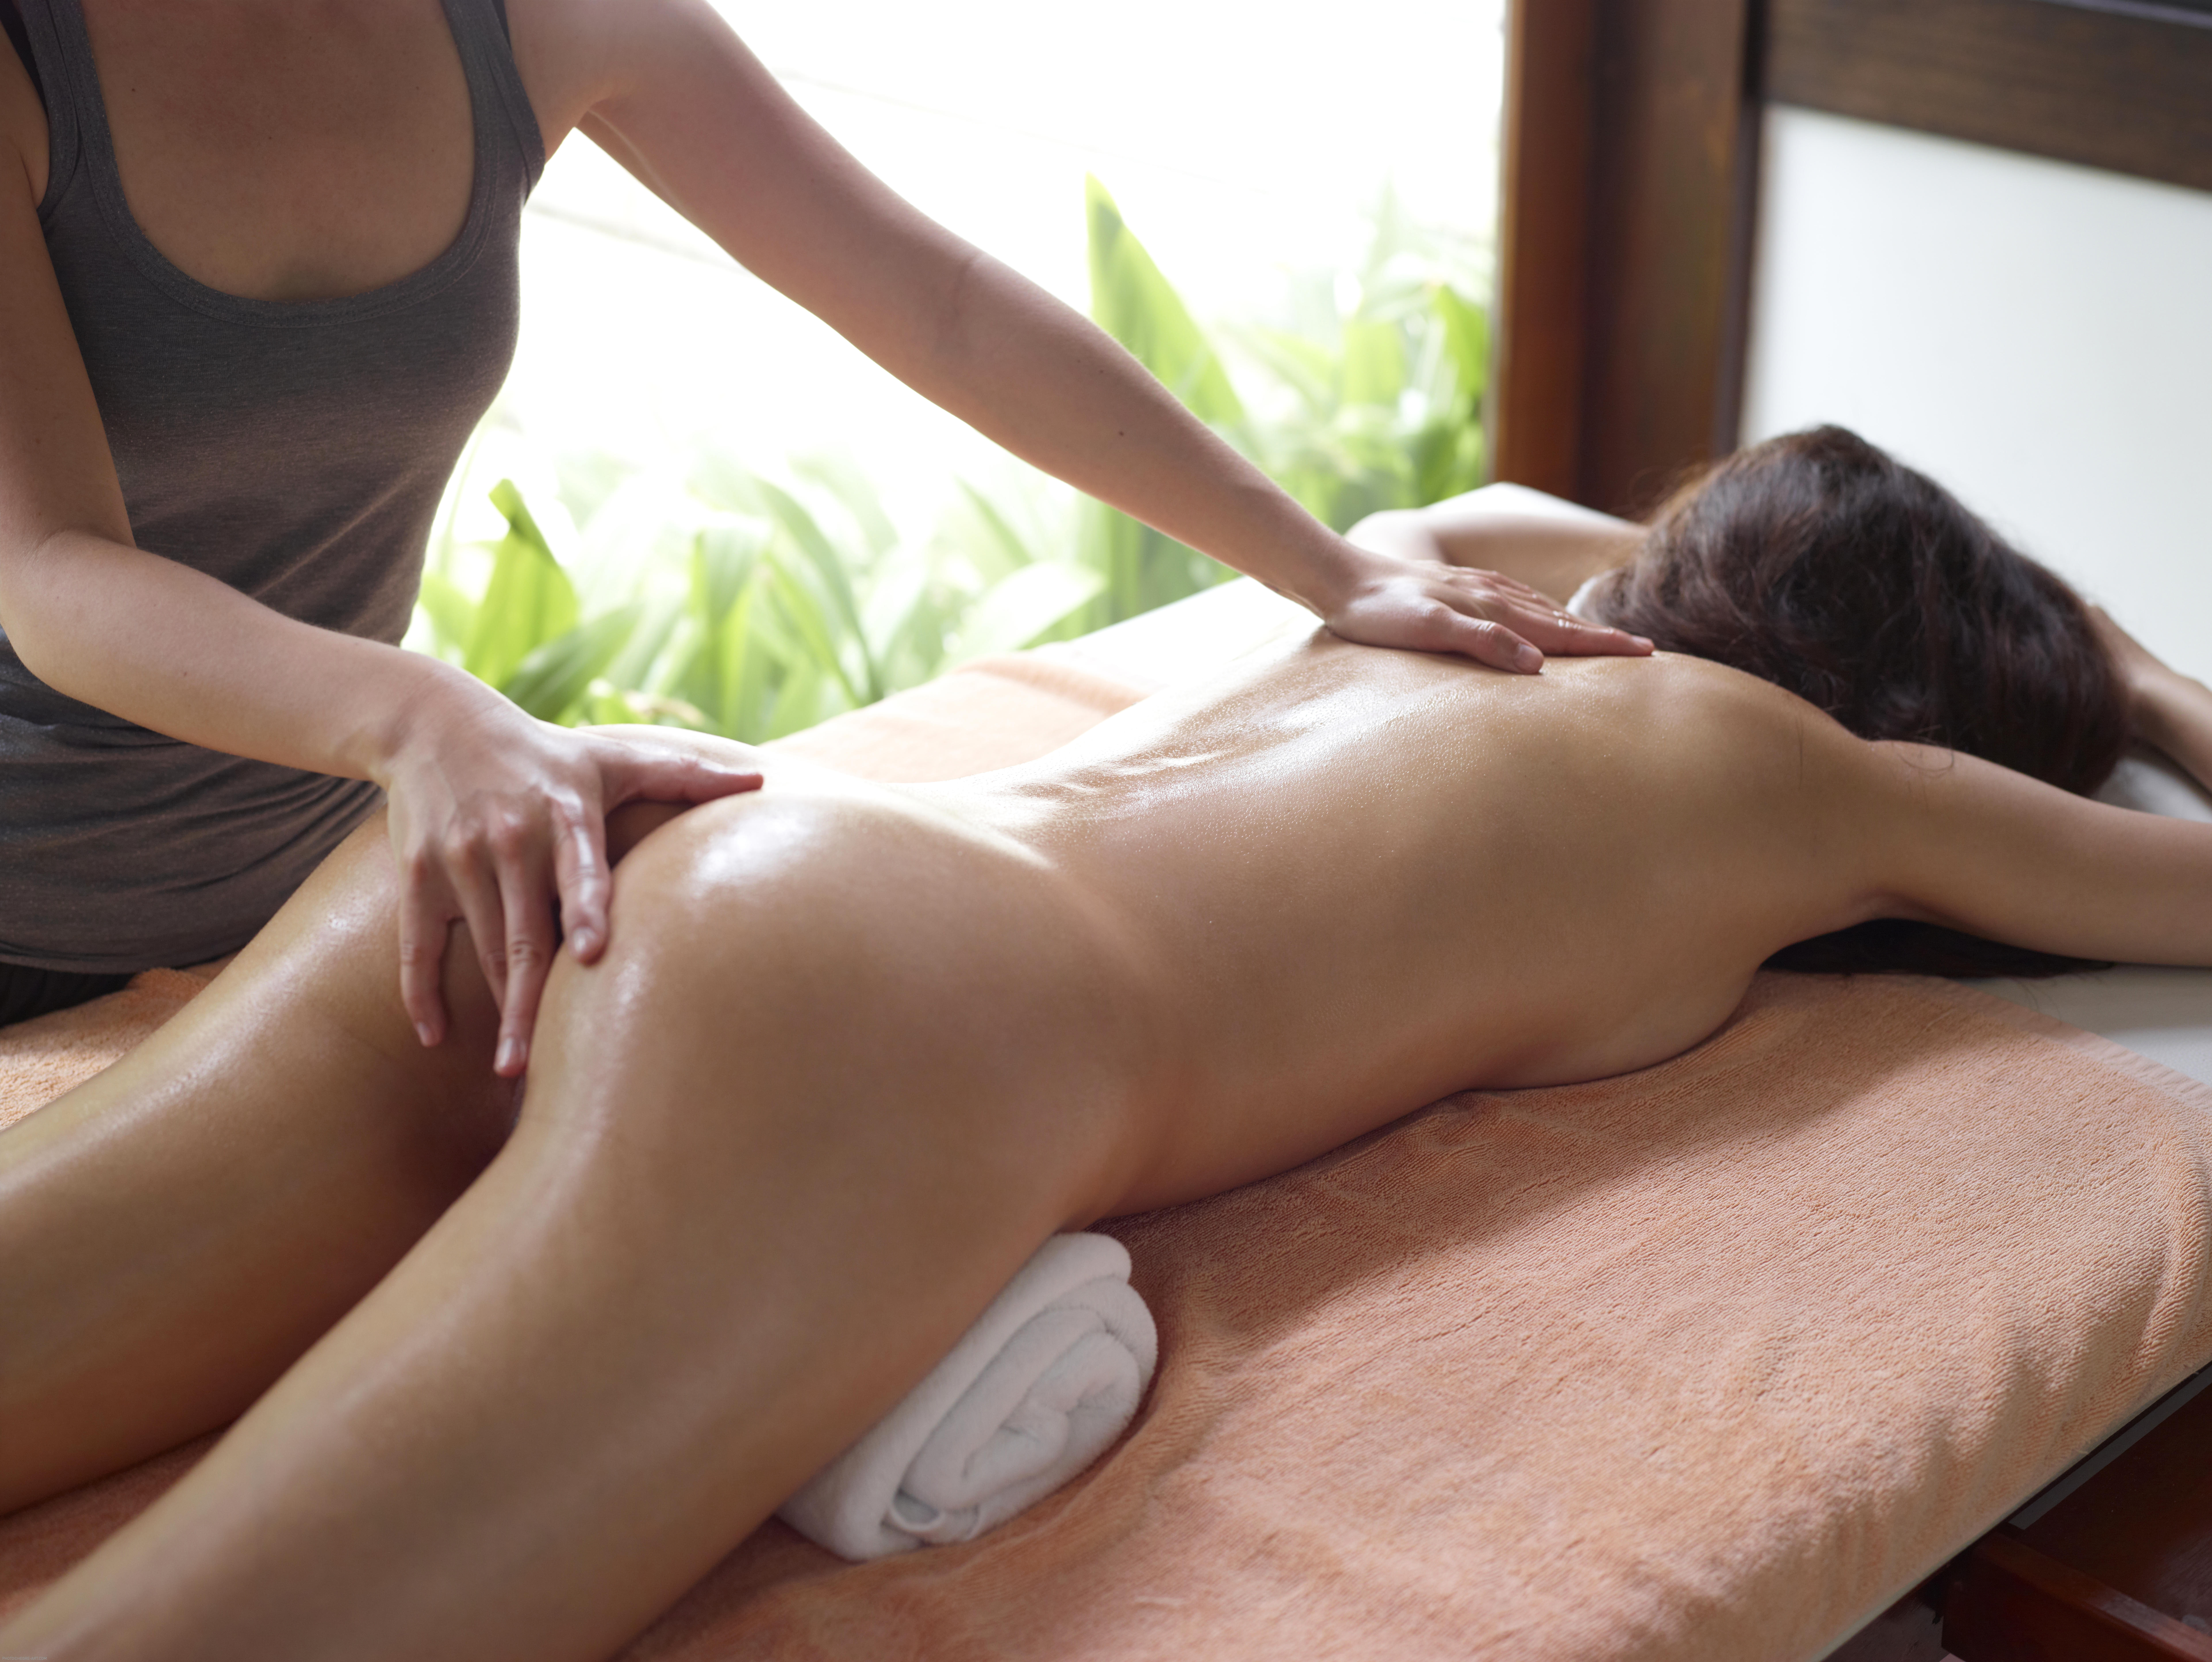 b2b erotic massage kvinnor sex